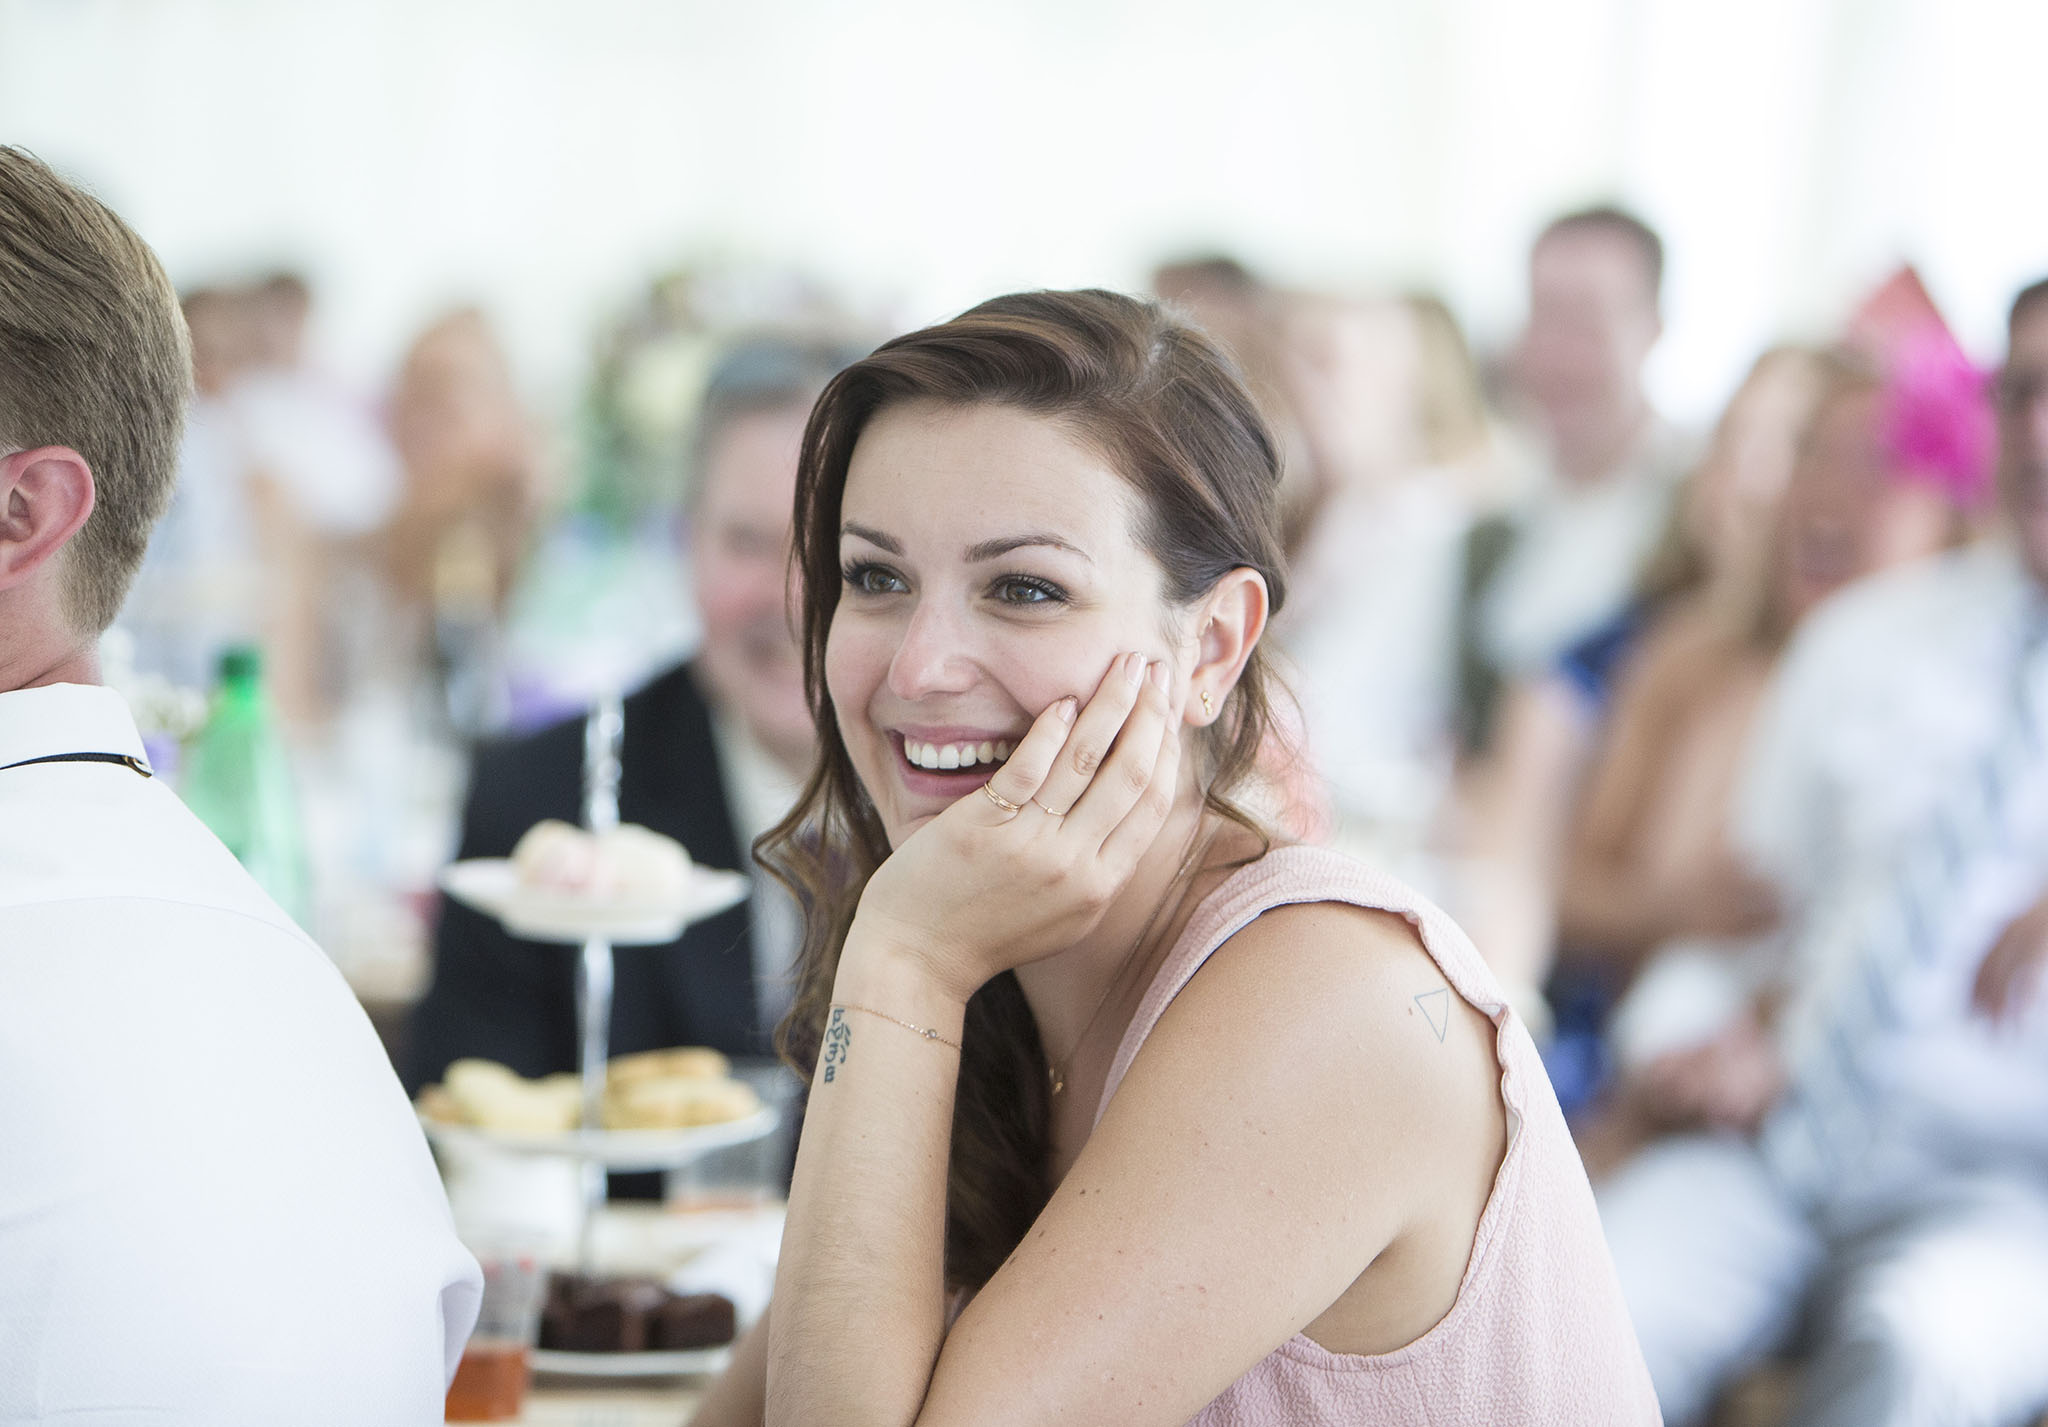 elizabethgphotography_kingslangley_hertfordshire_fineart_wedding_pottersbar_matt_katie_pegg_40.jpg